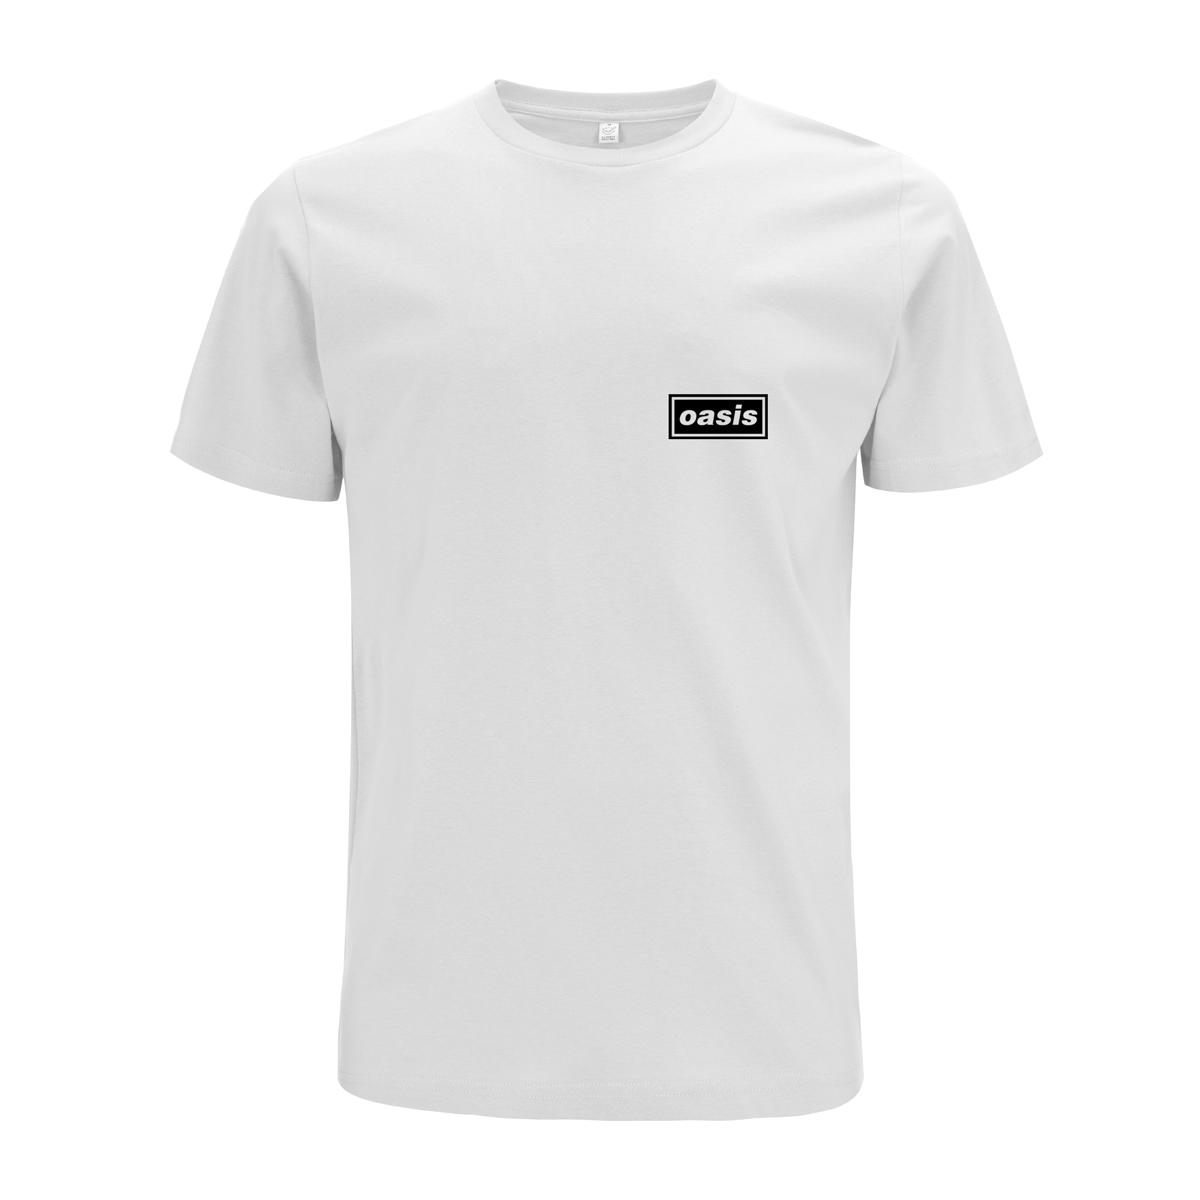 Buy Online Oasis - Rockfield T-Shirt (Ltd Edition)